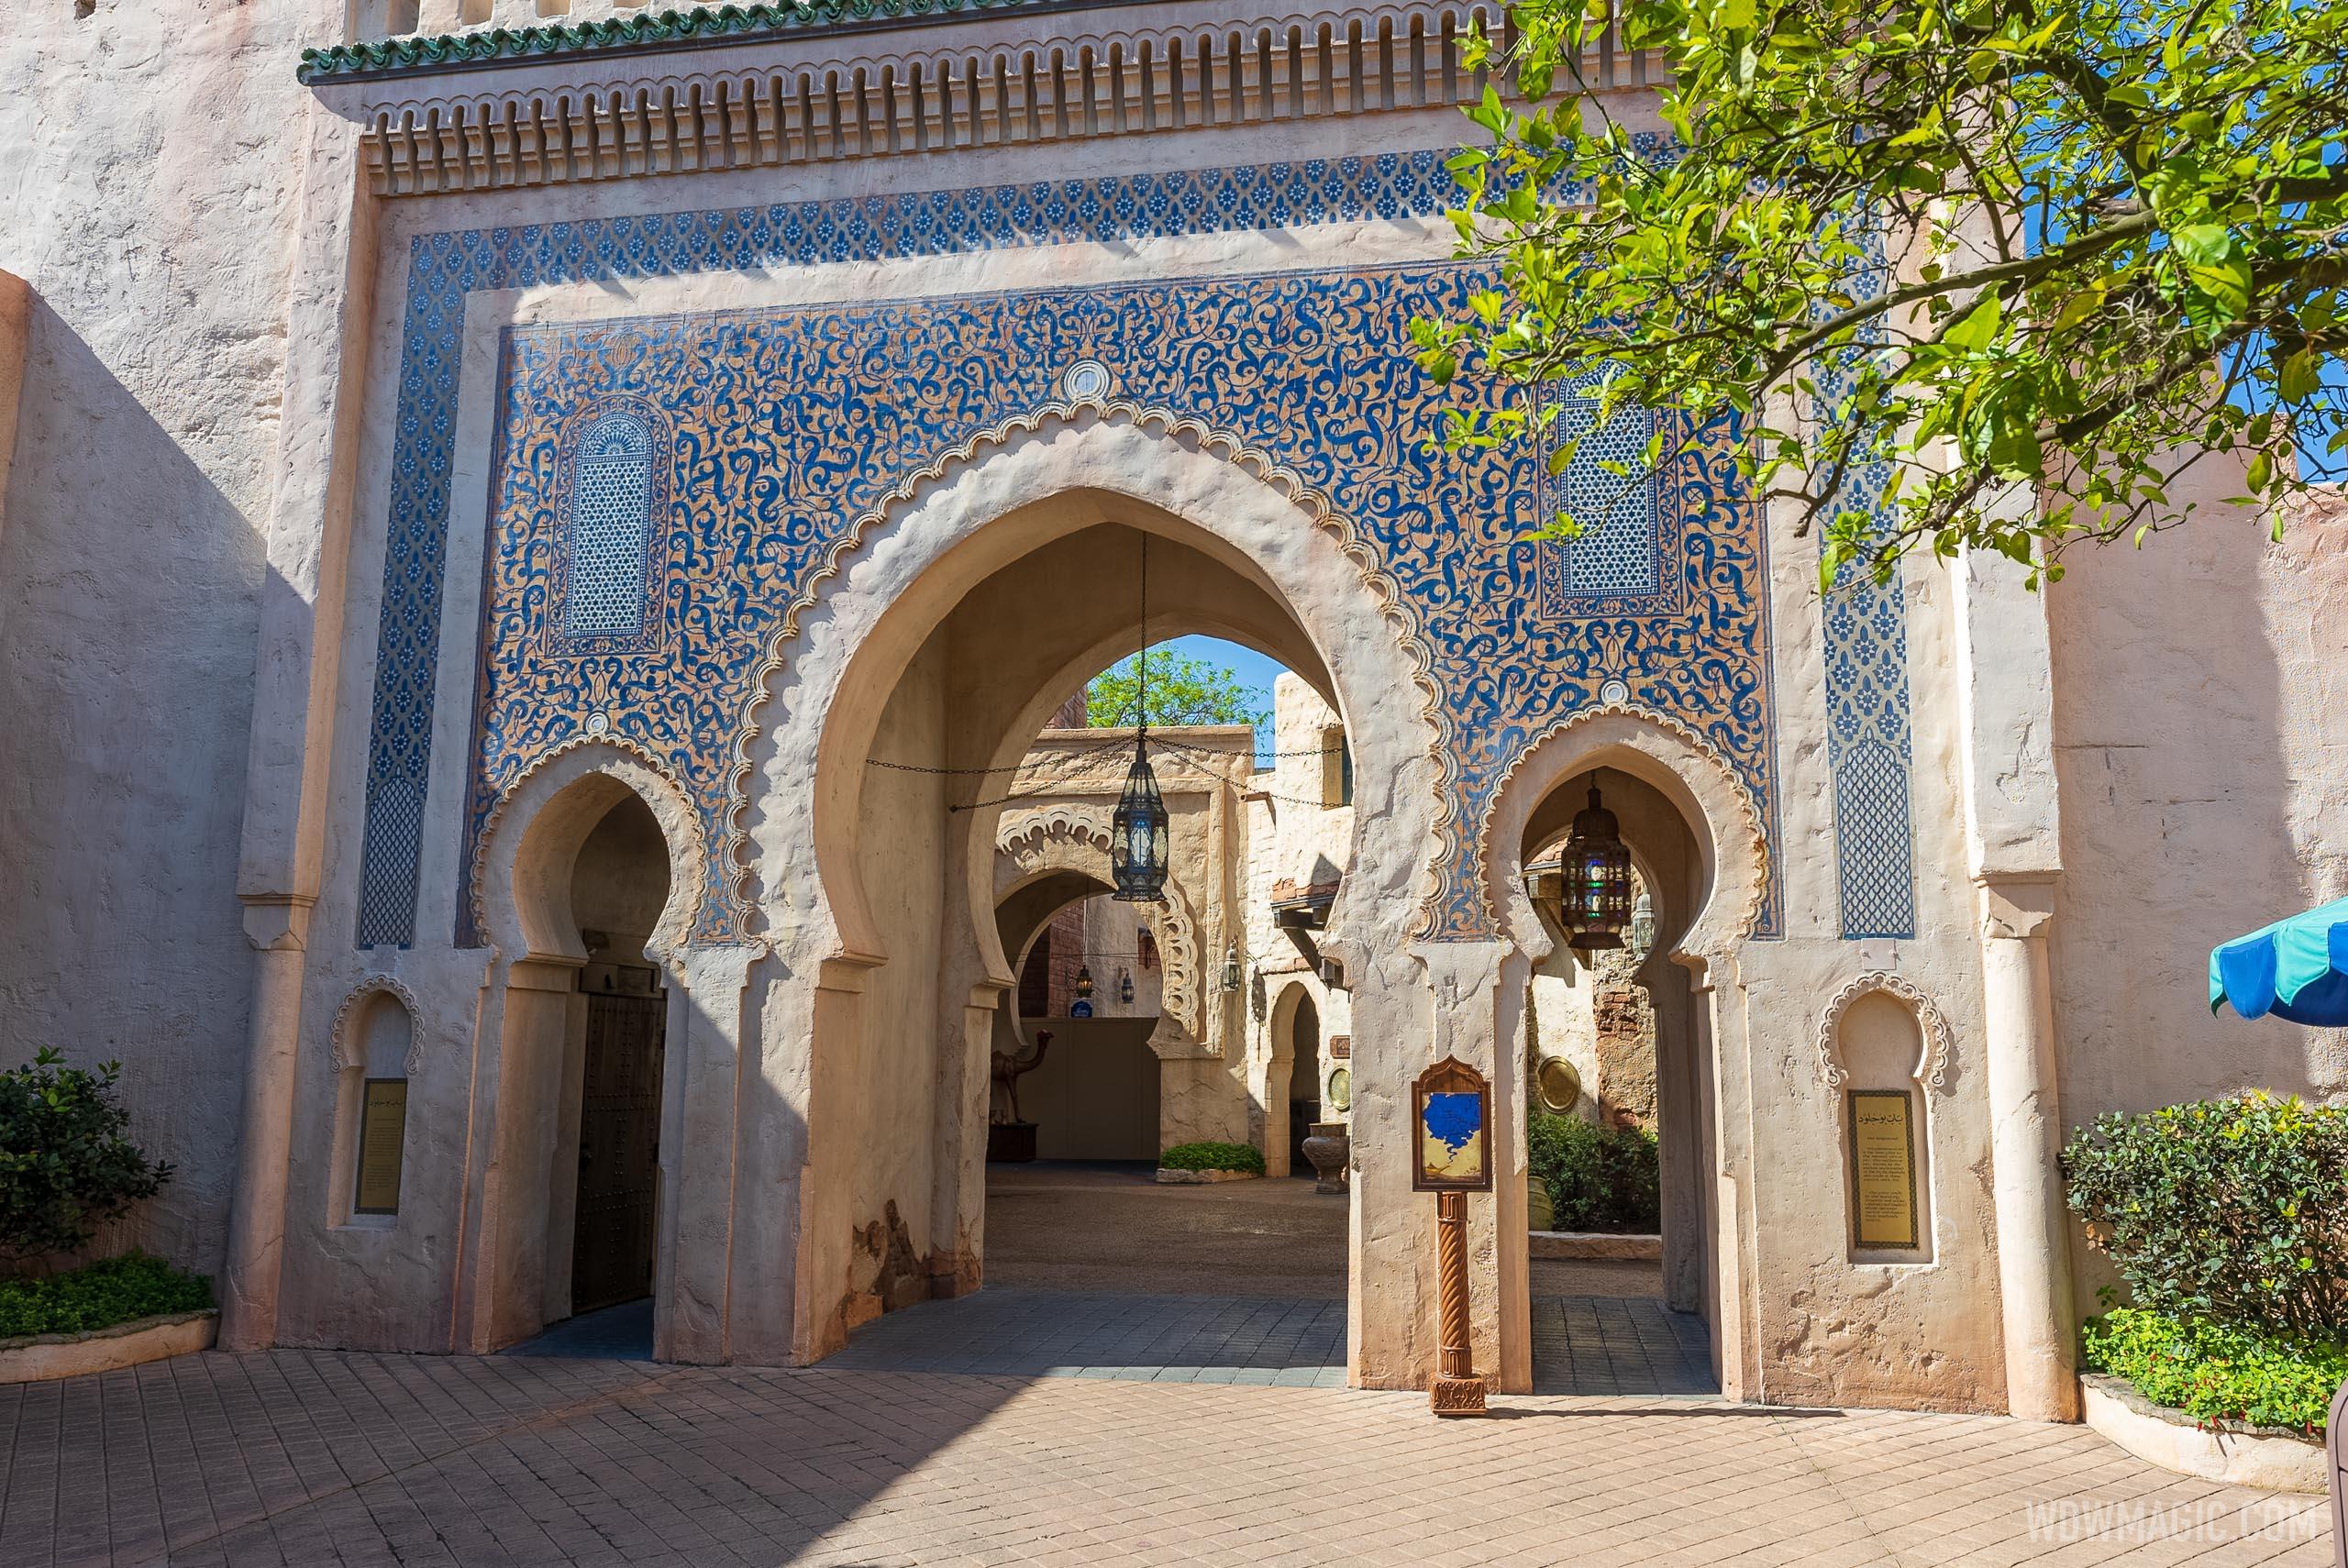 Morocco Pavilion refurbishment walls - April 5 2021